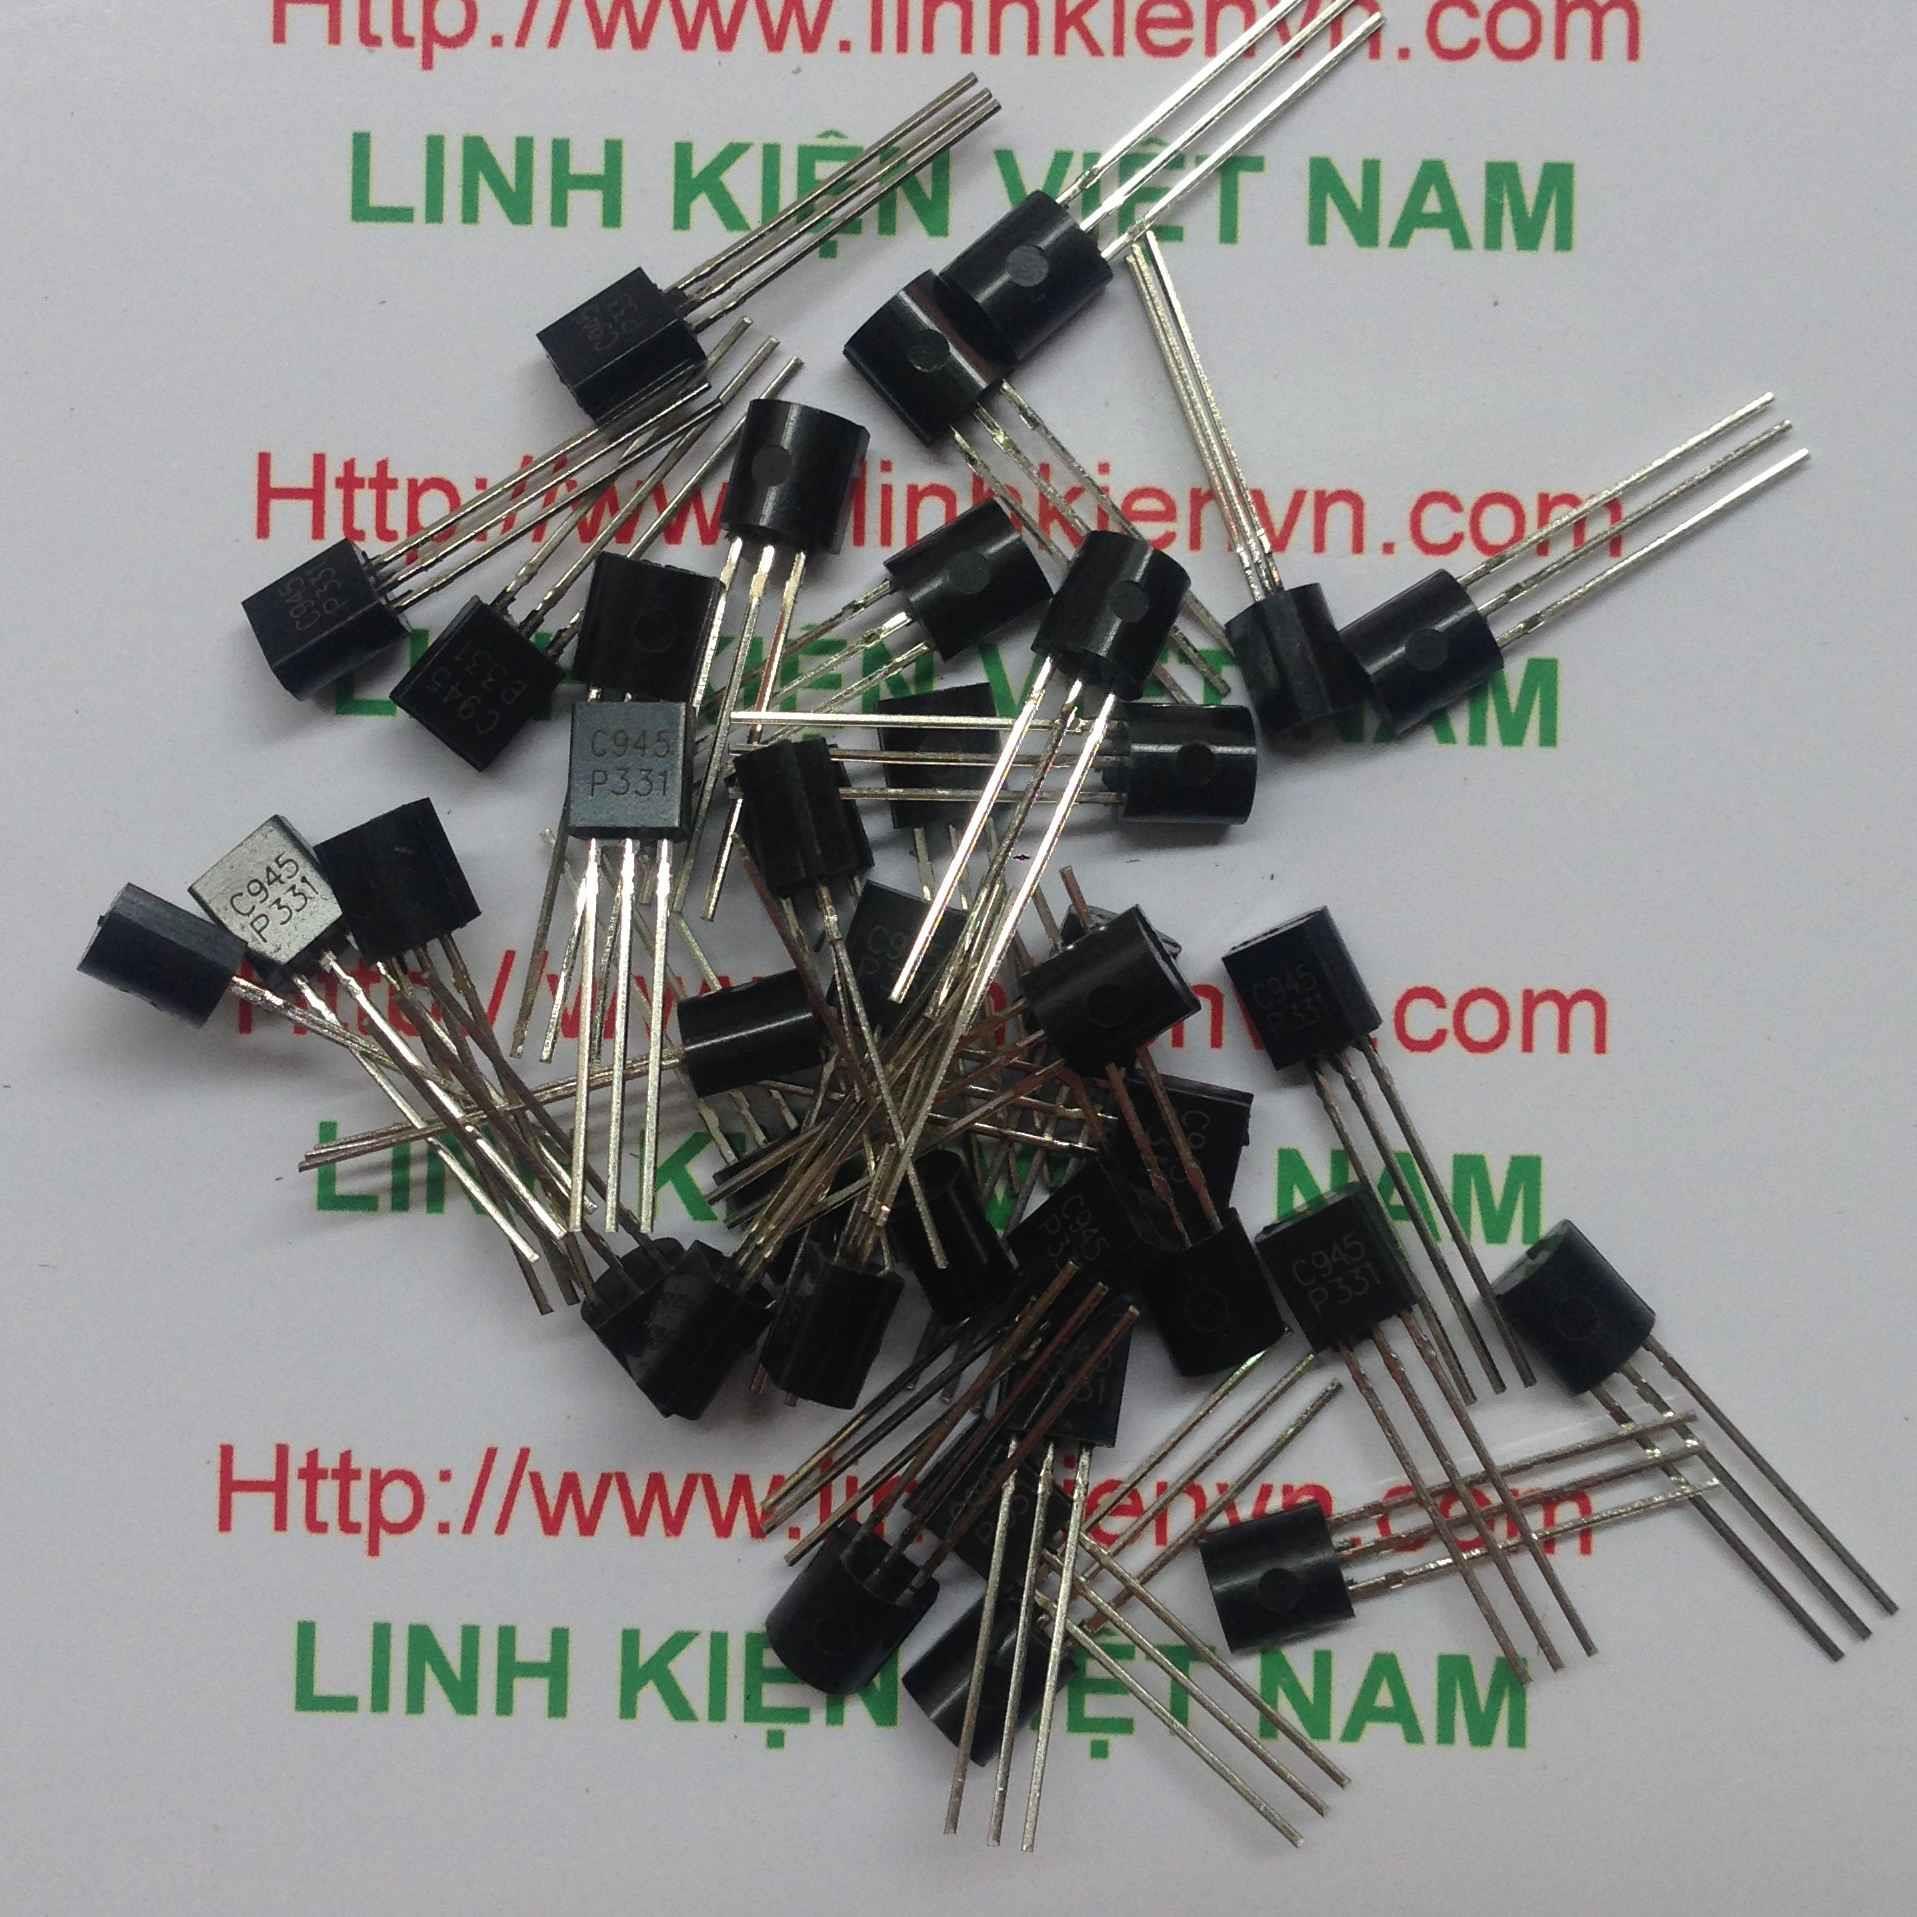 Transistor NPN C945 TO-92 150mA 60V - B8H4